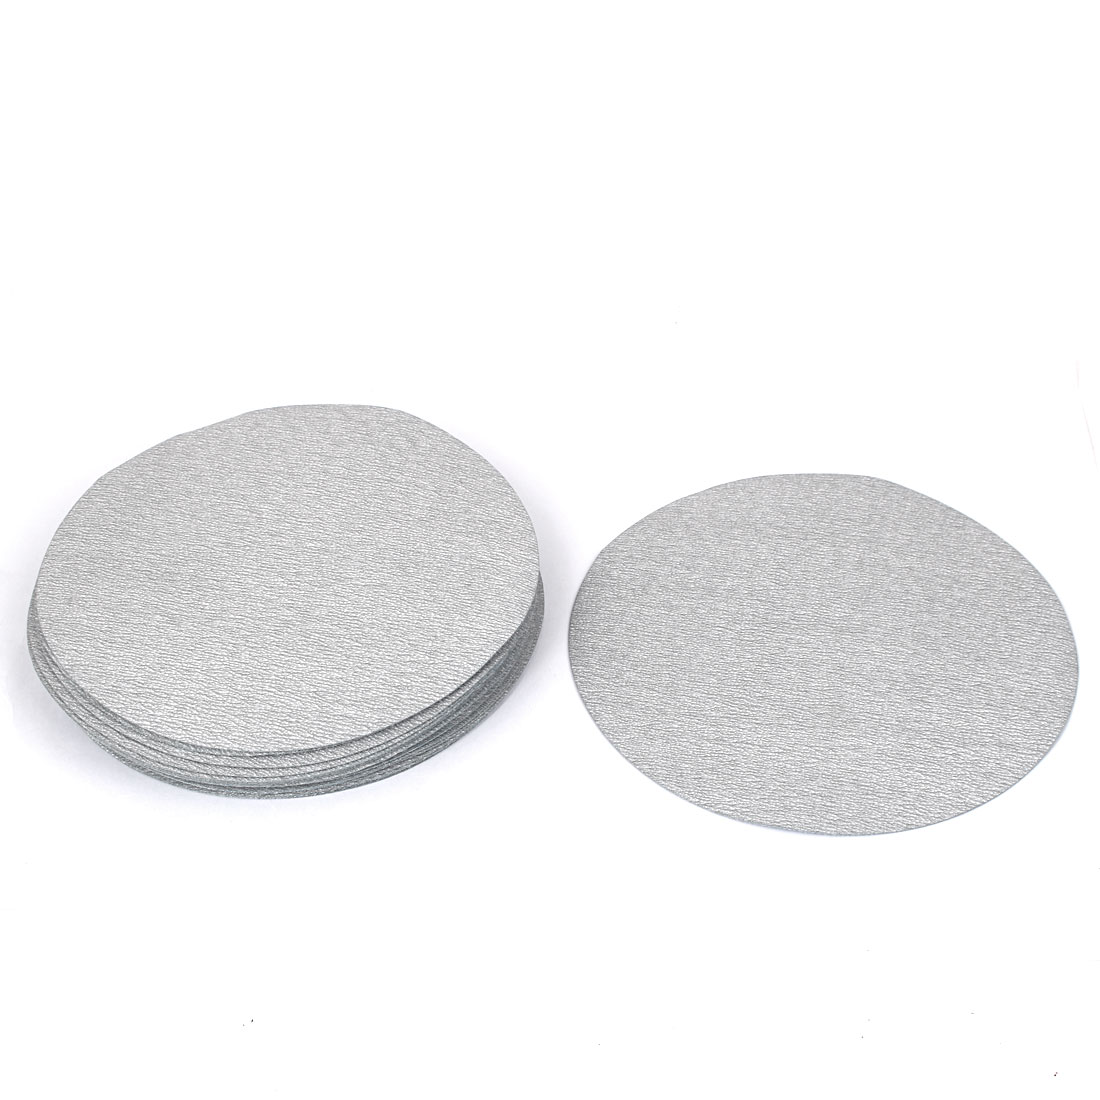 7inch Dia Round Dry Abrasive Sanding Flocking Sandpaper Disc 800 Grit 20pcs